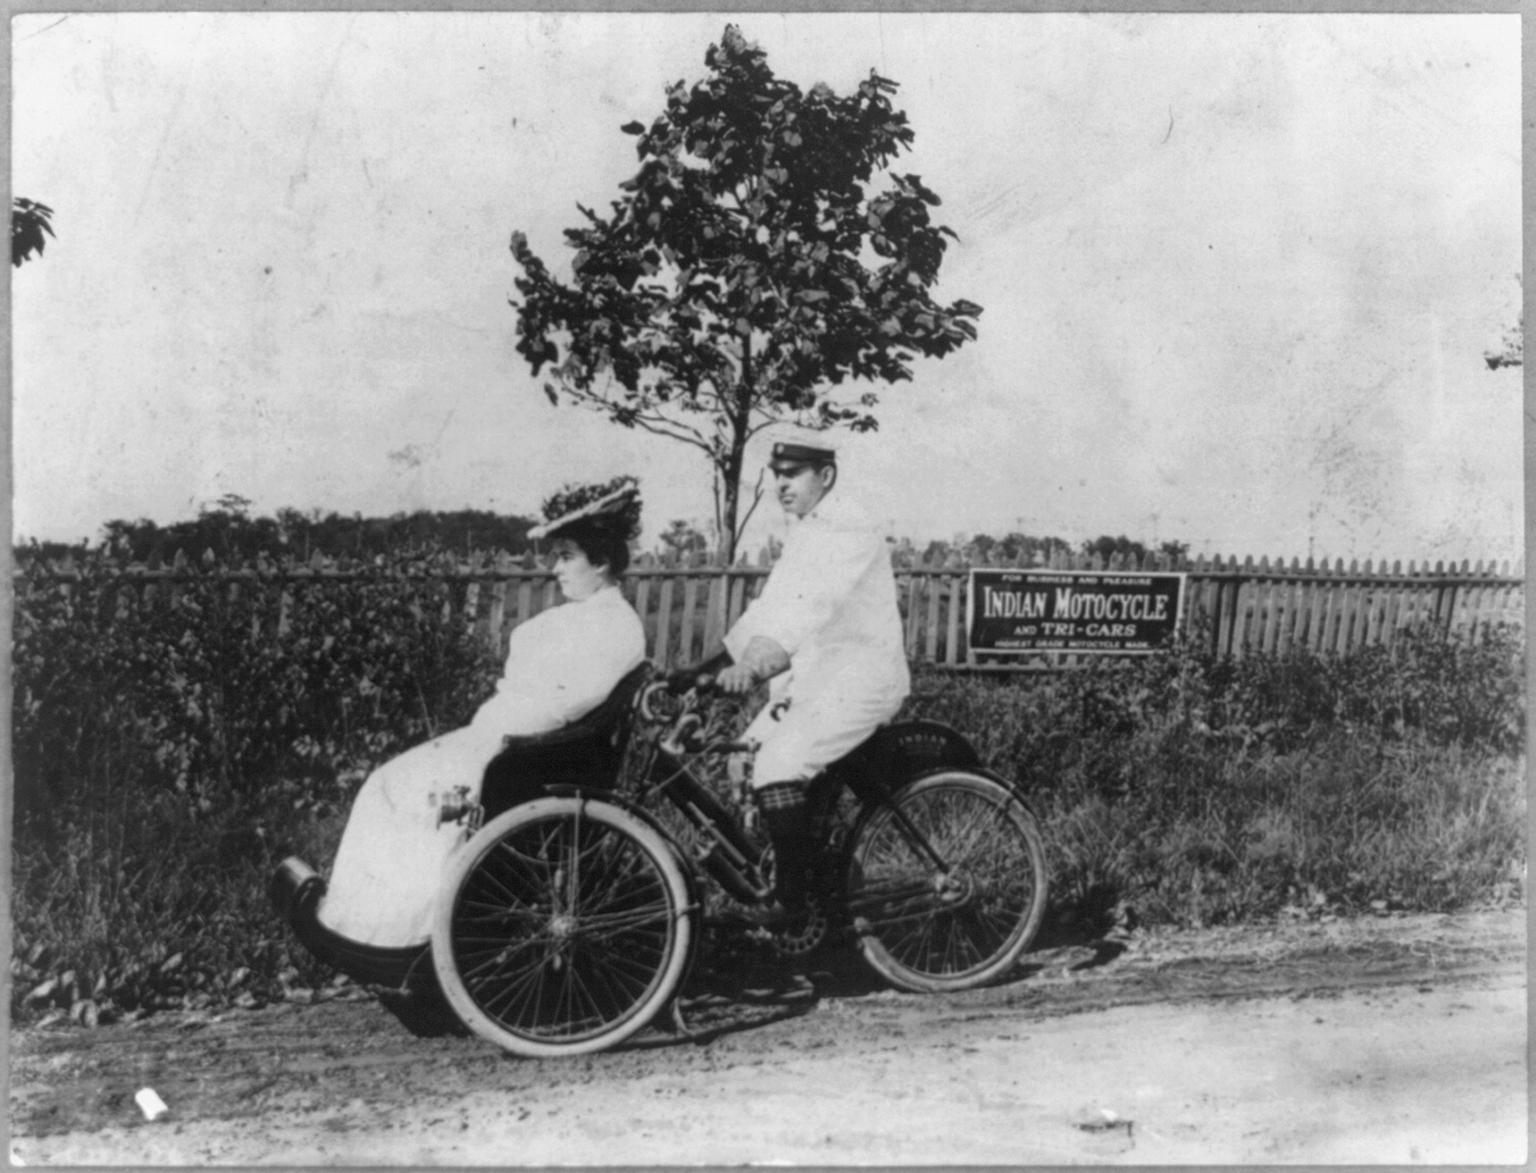 1908 Indian Tri-Car